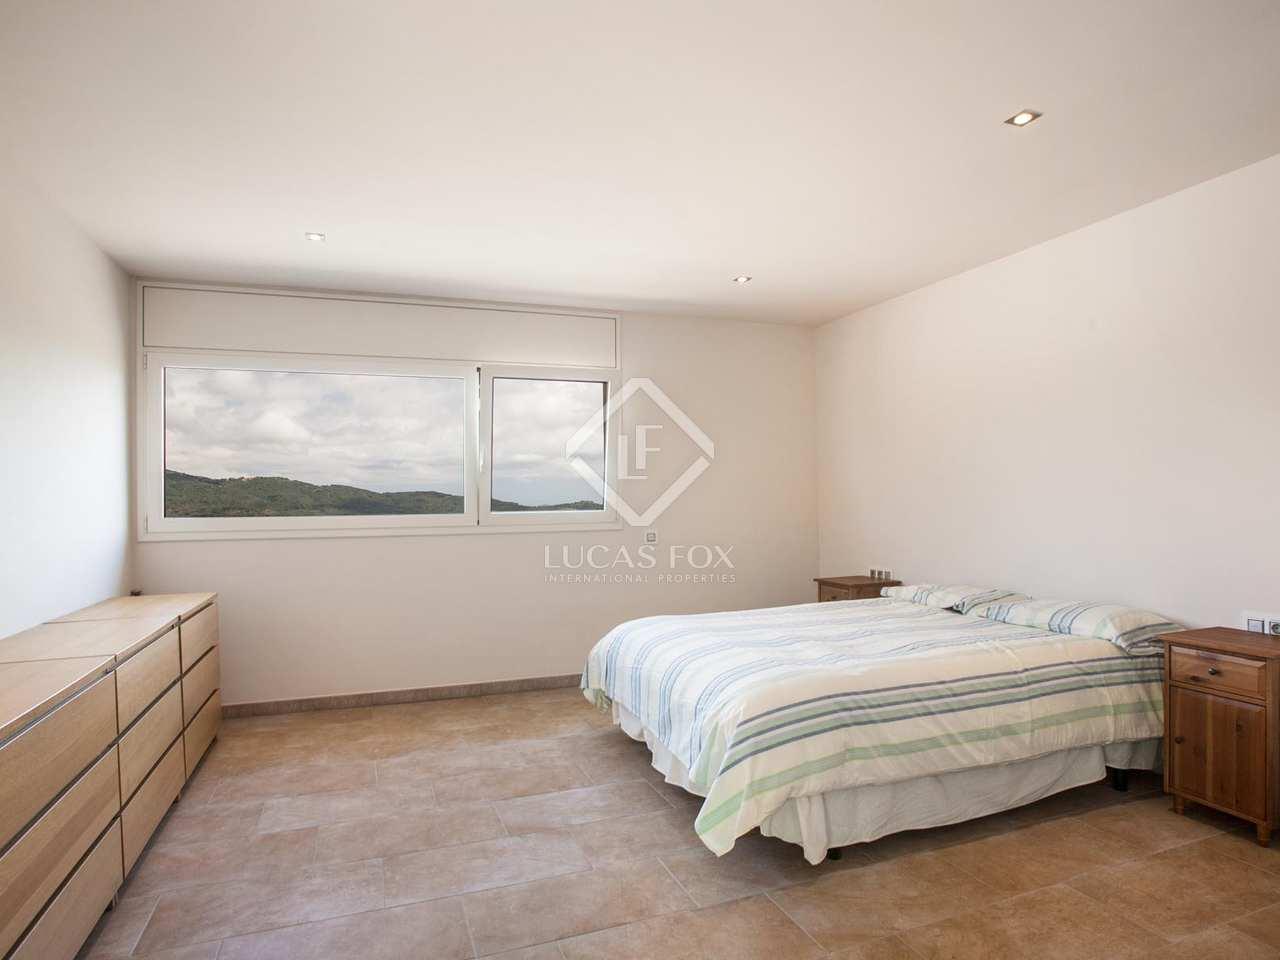 Stunning 5 bedroom house for sale in argentona maresme for 5 bedroom house for sale